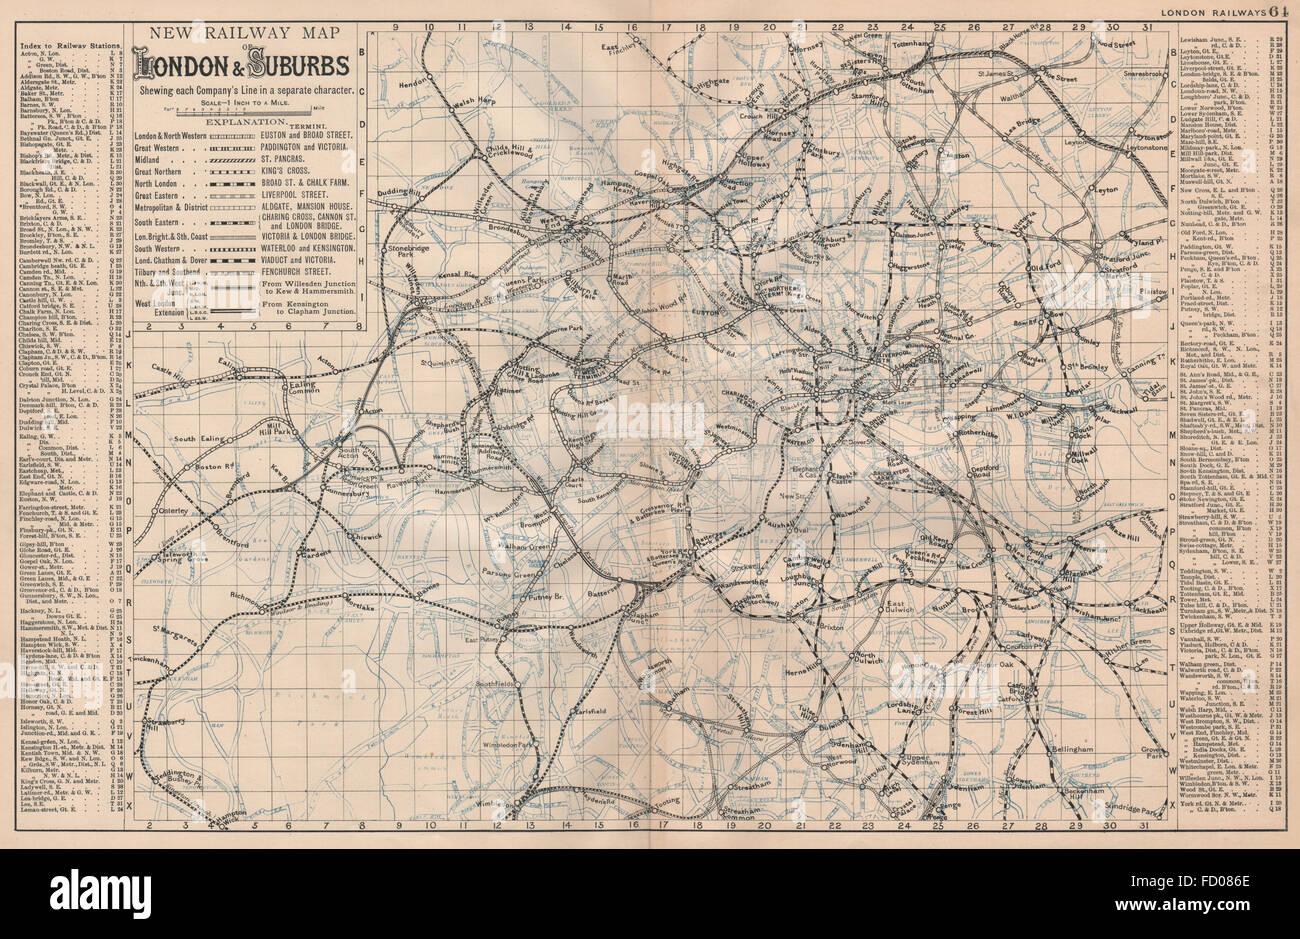 London And Suburbs Map.London Undergound Overground Railway Map Of London Suburbs